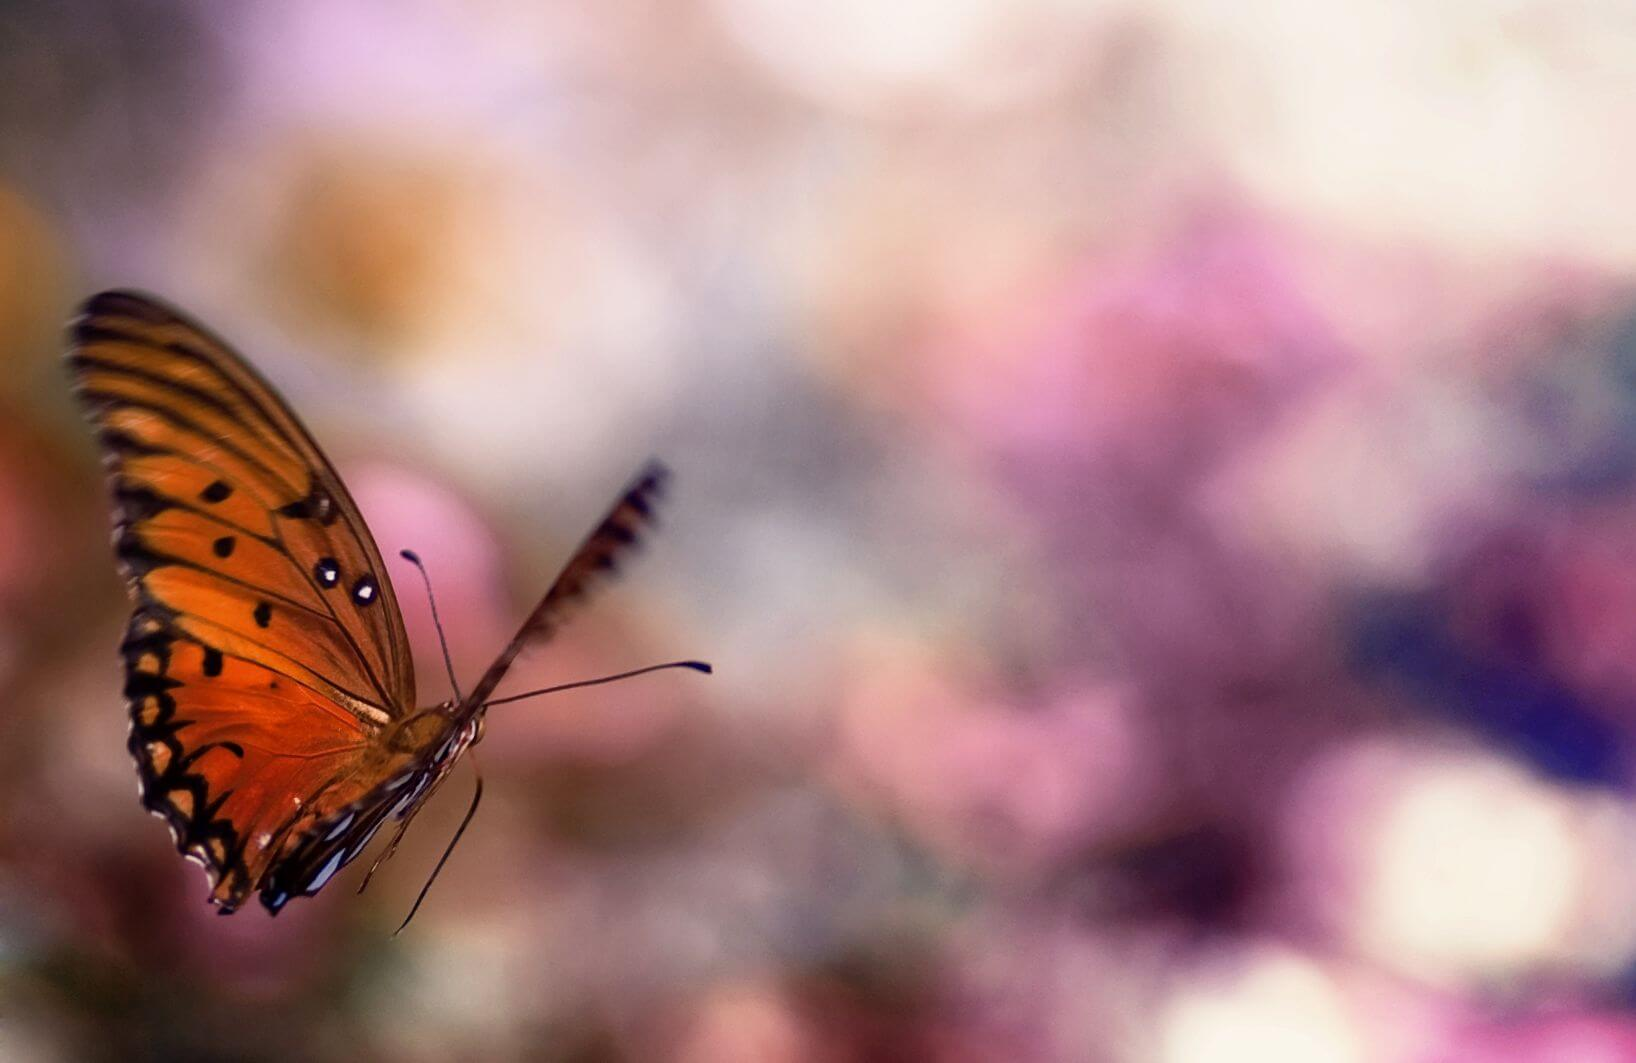 Adapt like a butterfly